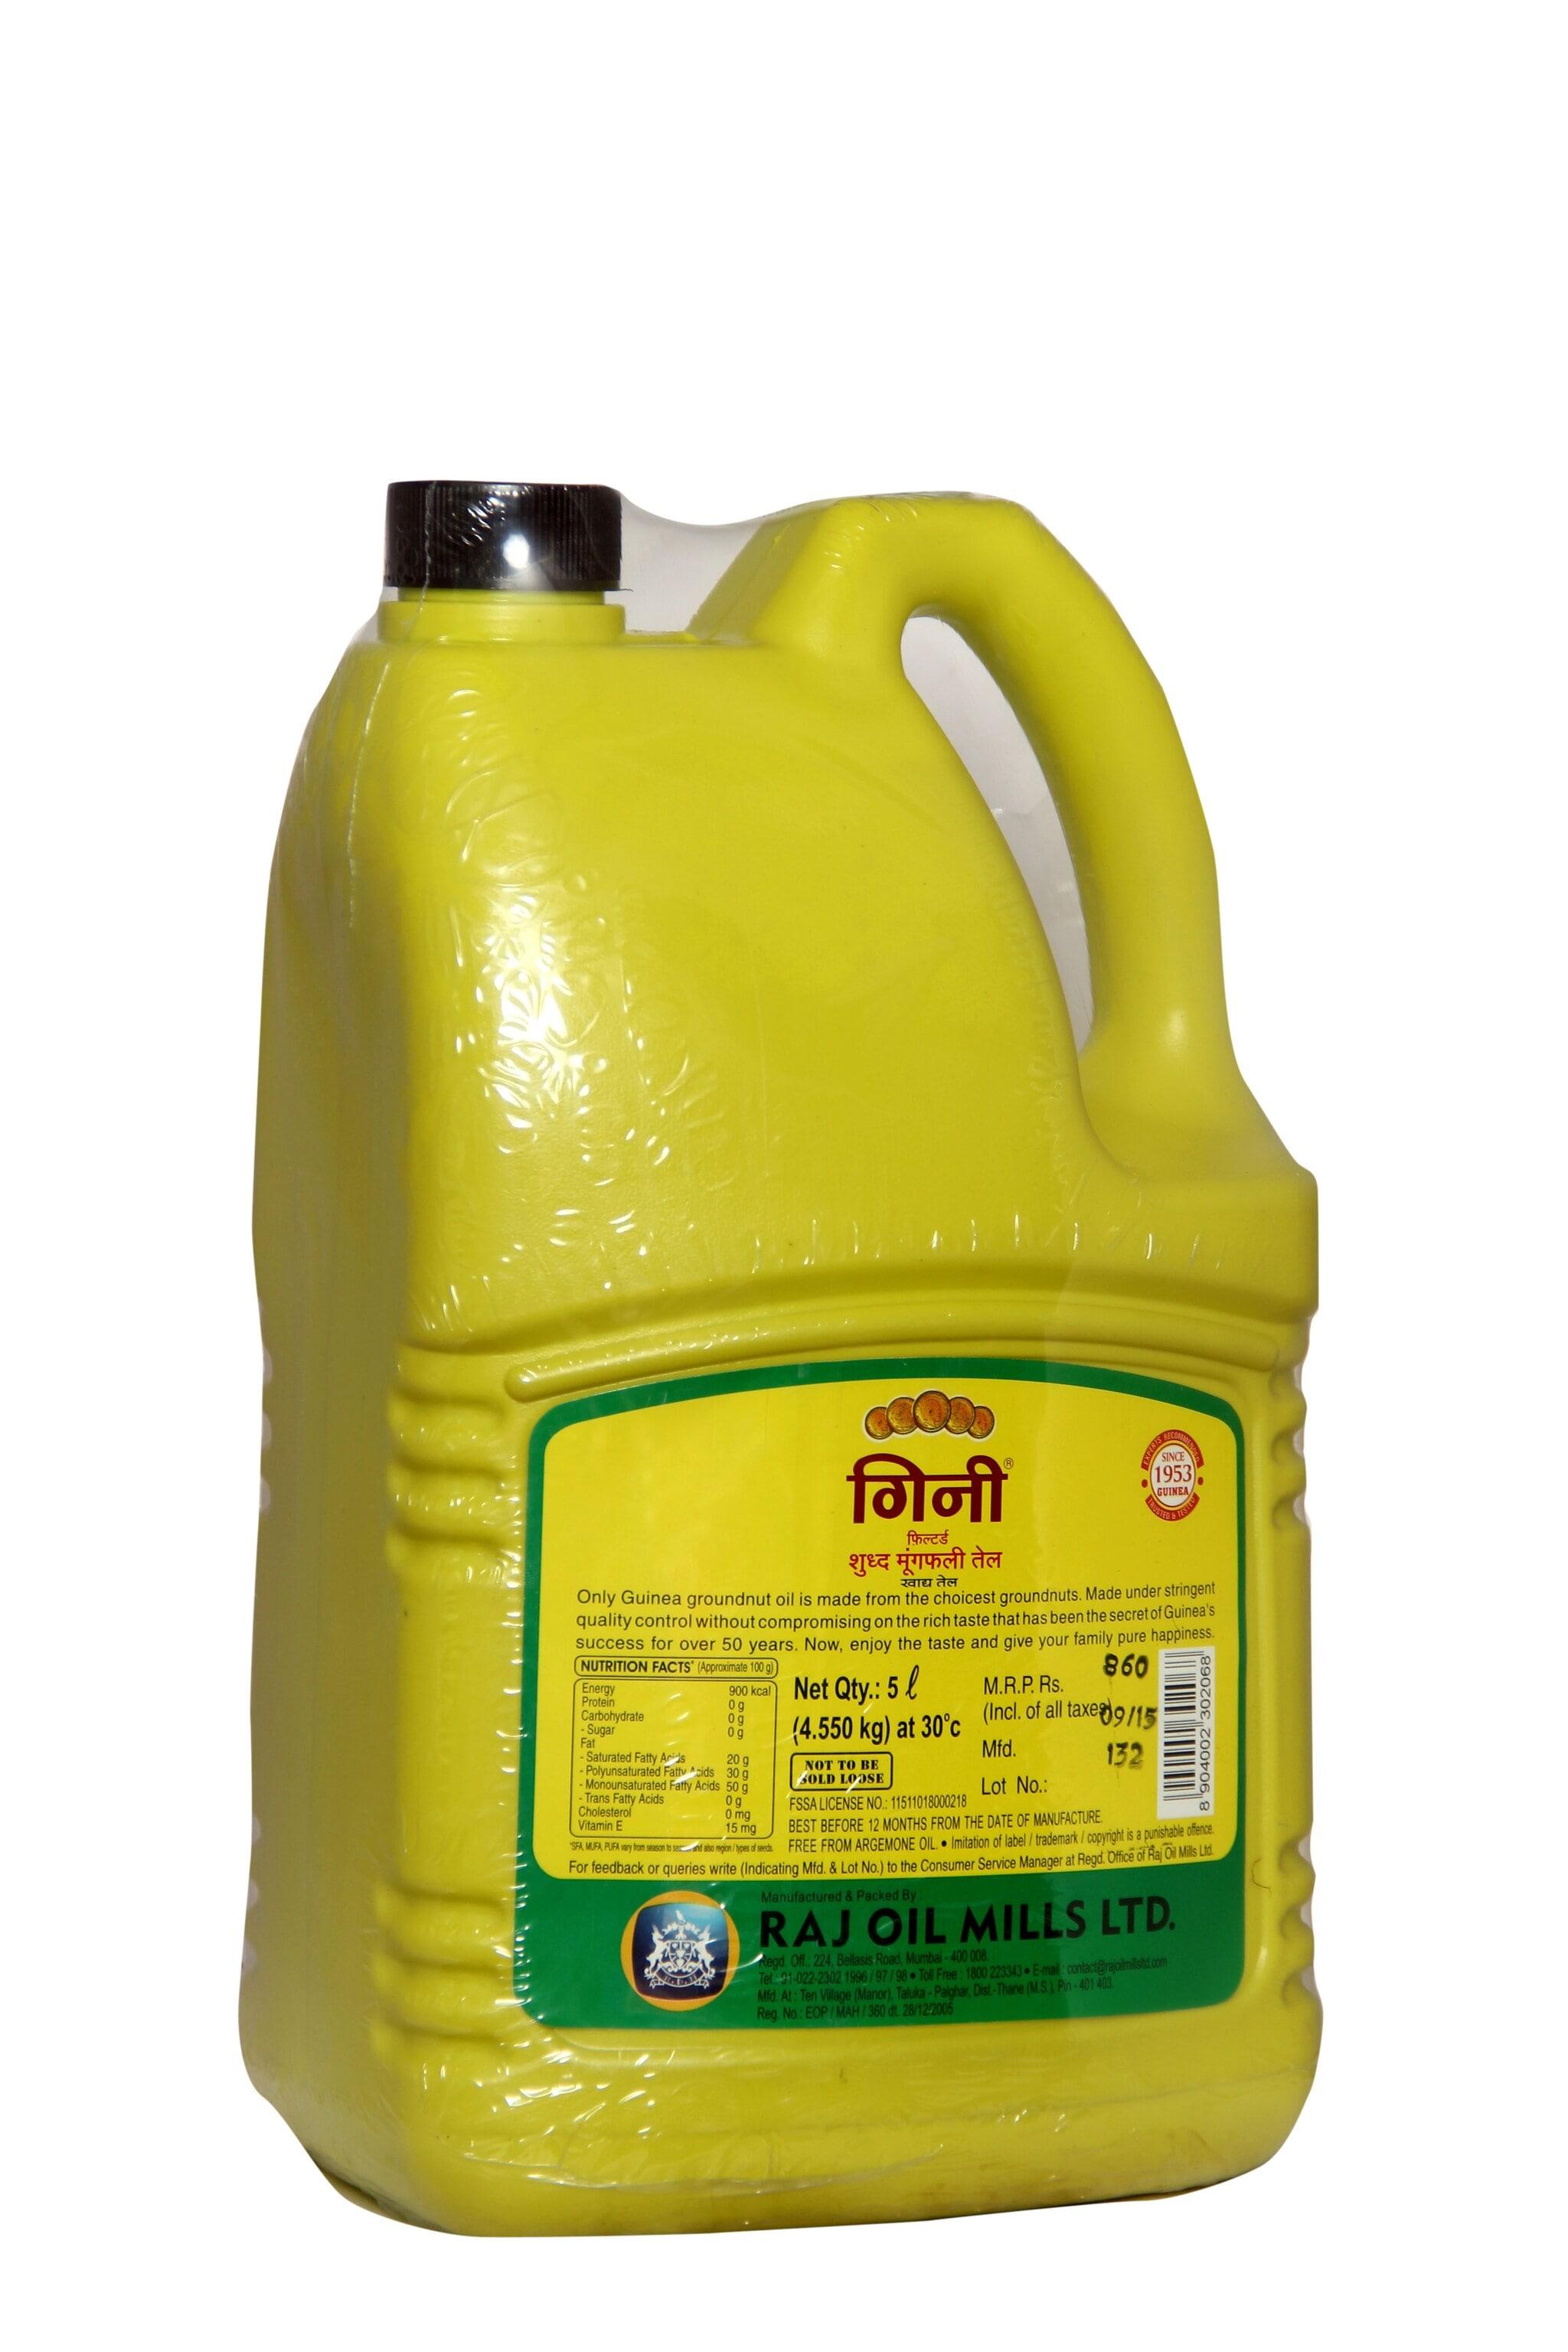 Guinea Filtered Pure GroundNut Oil 4.5 Kg